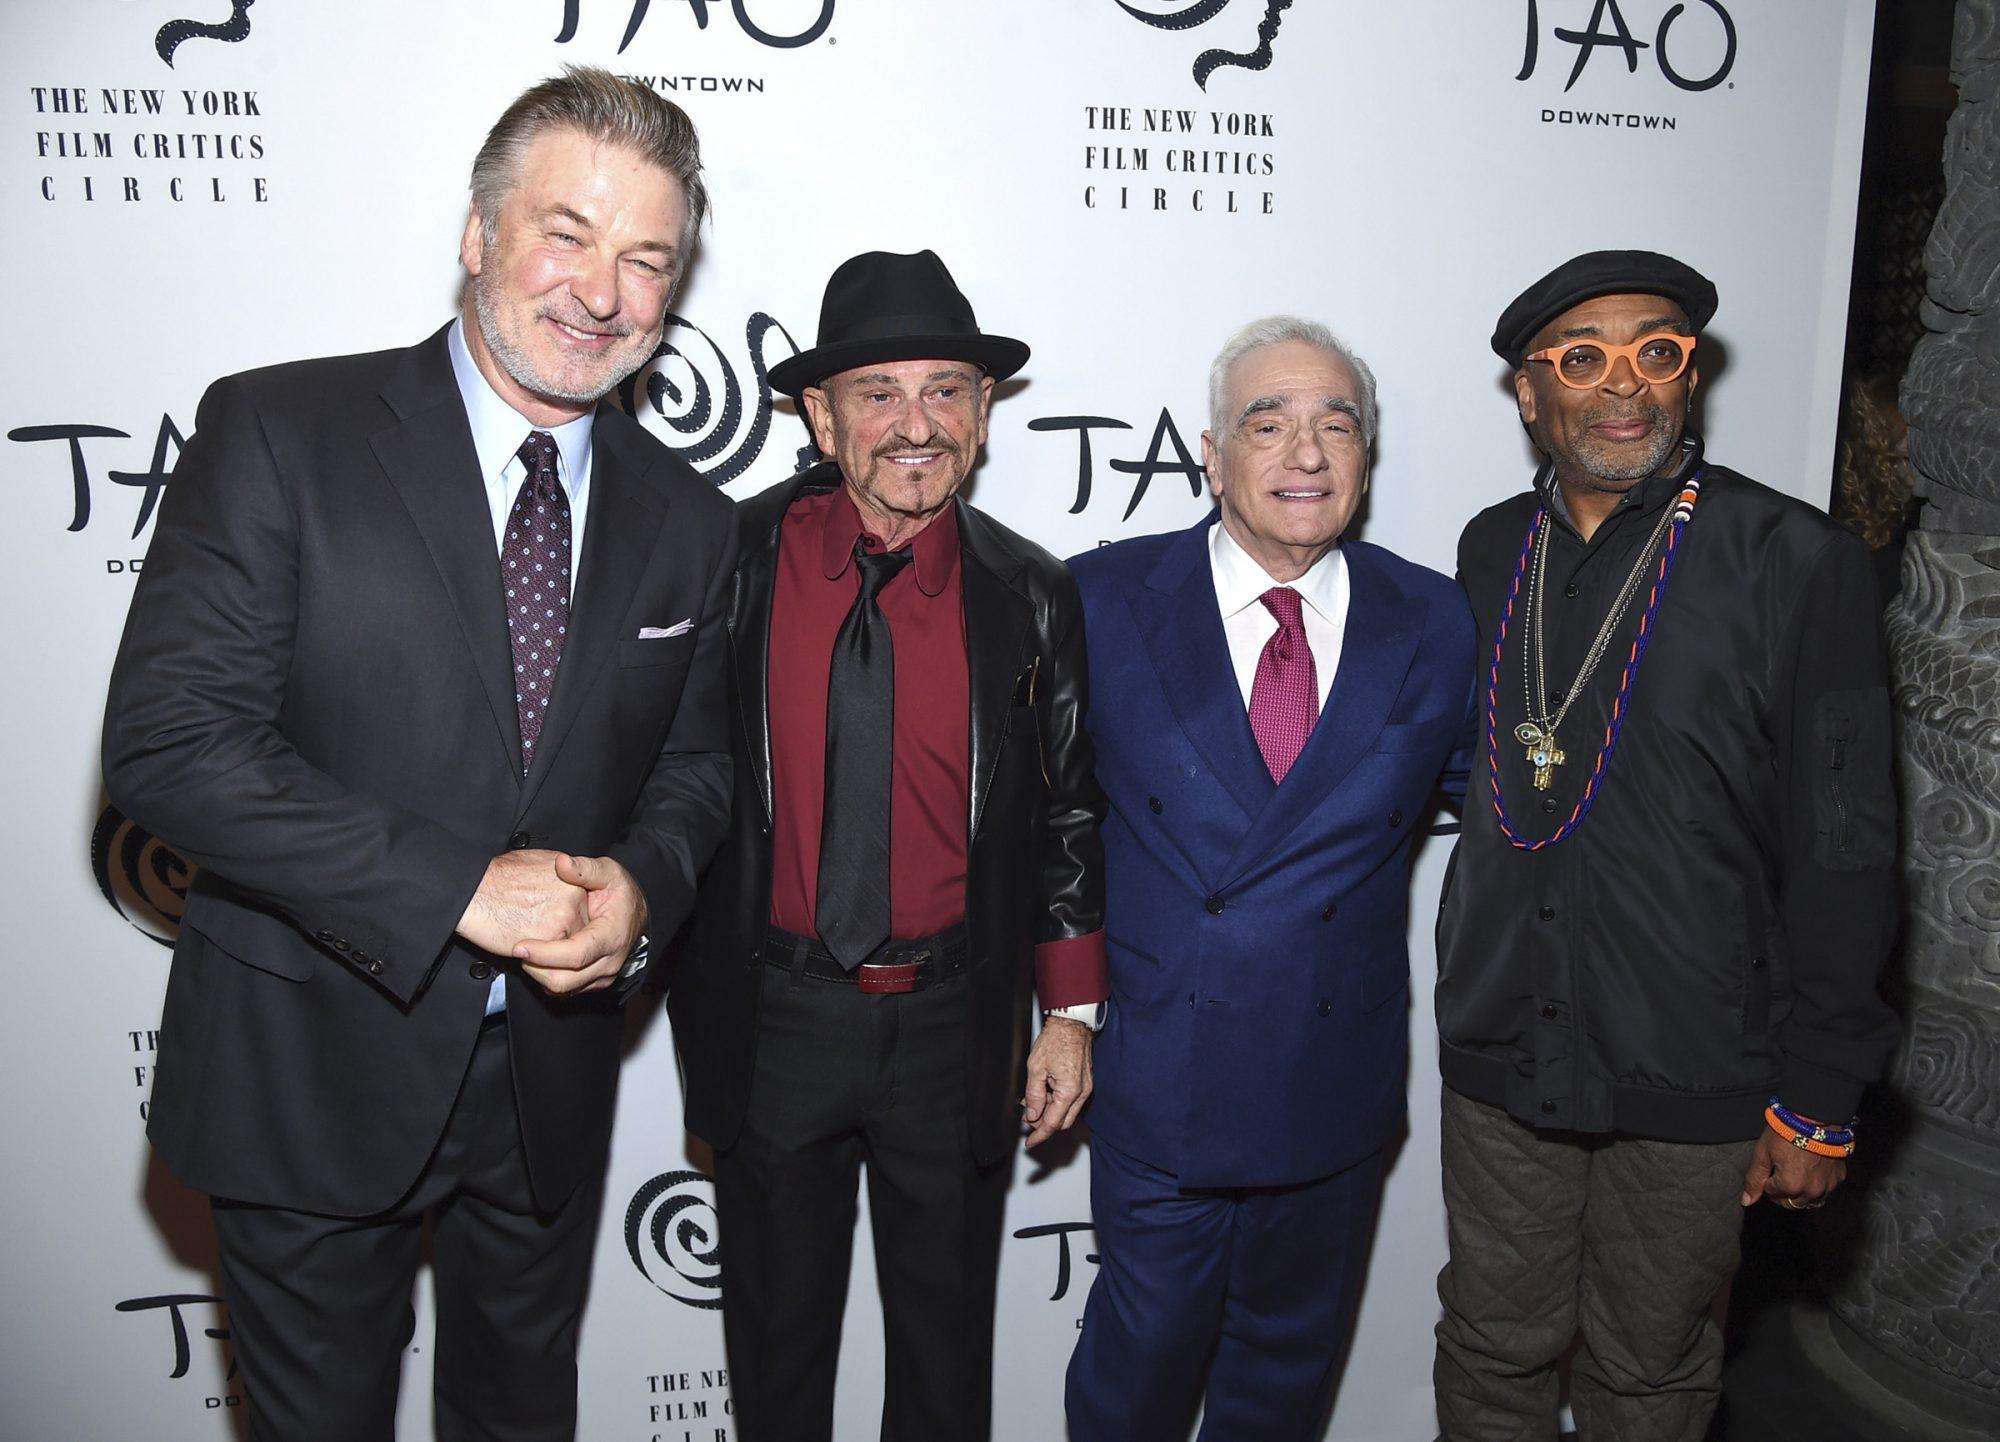 2019 New York Film Critics Circle Awards